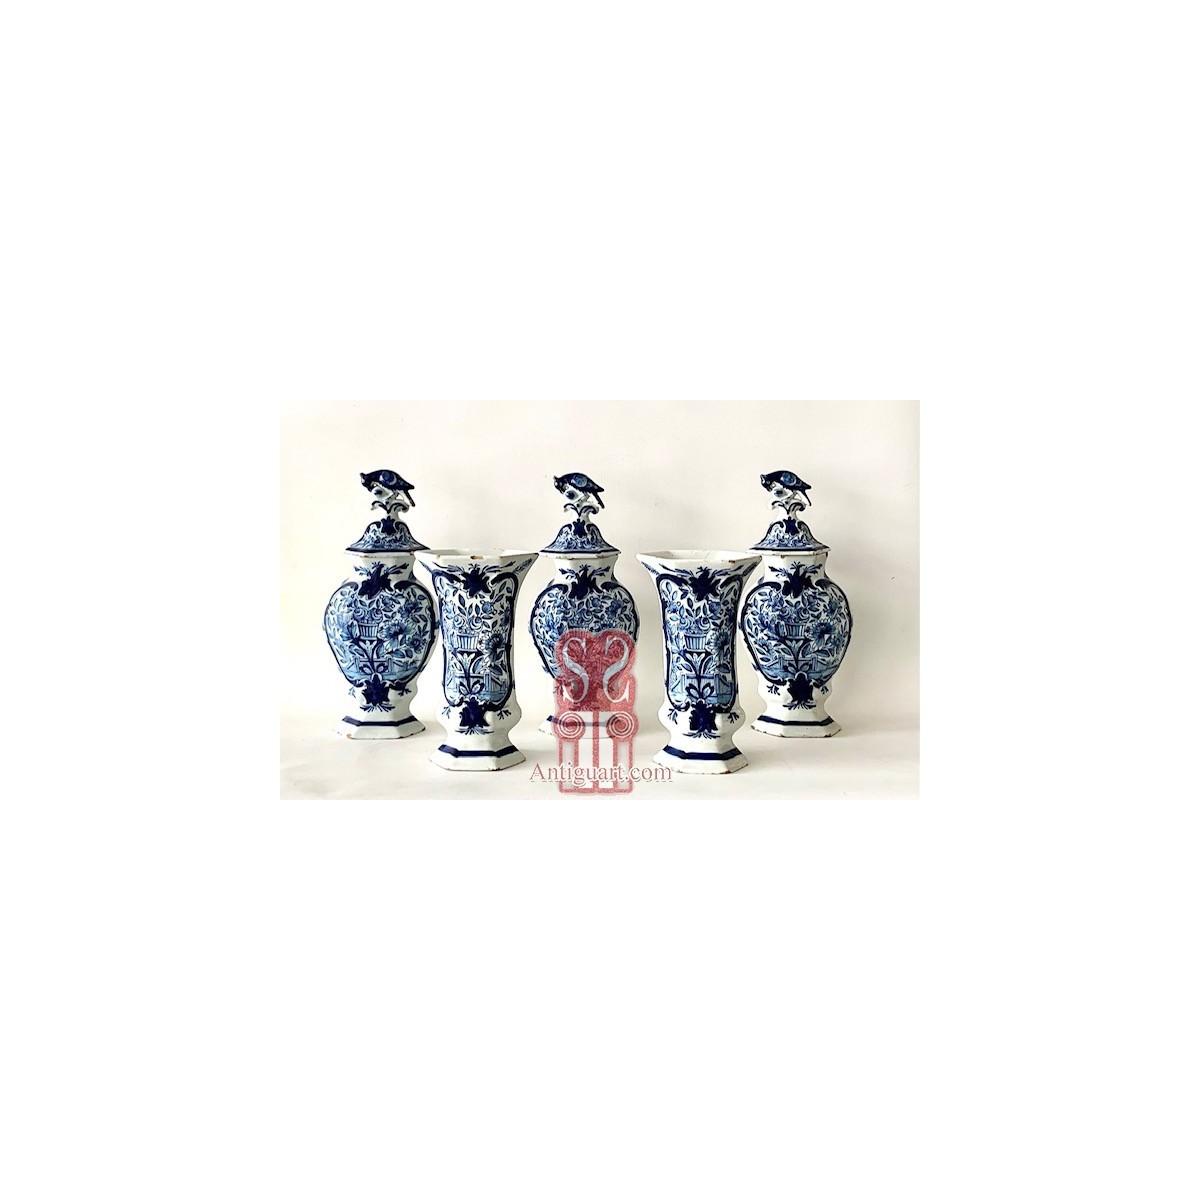 Garniture of five 18th Dutch Delft majolica vases